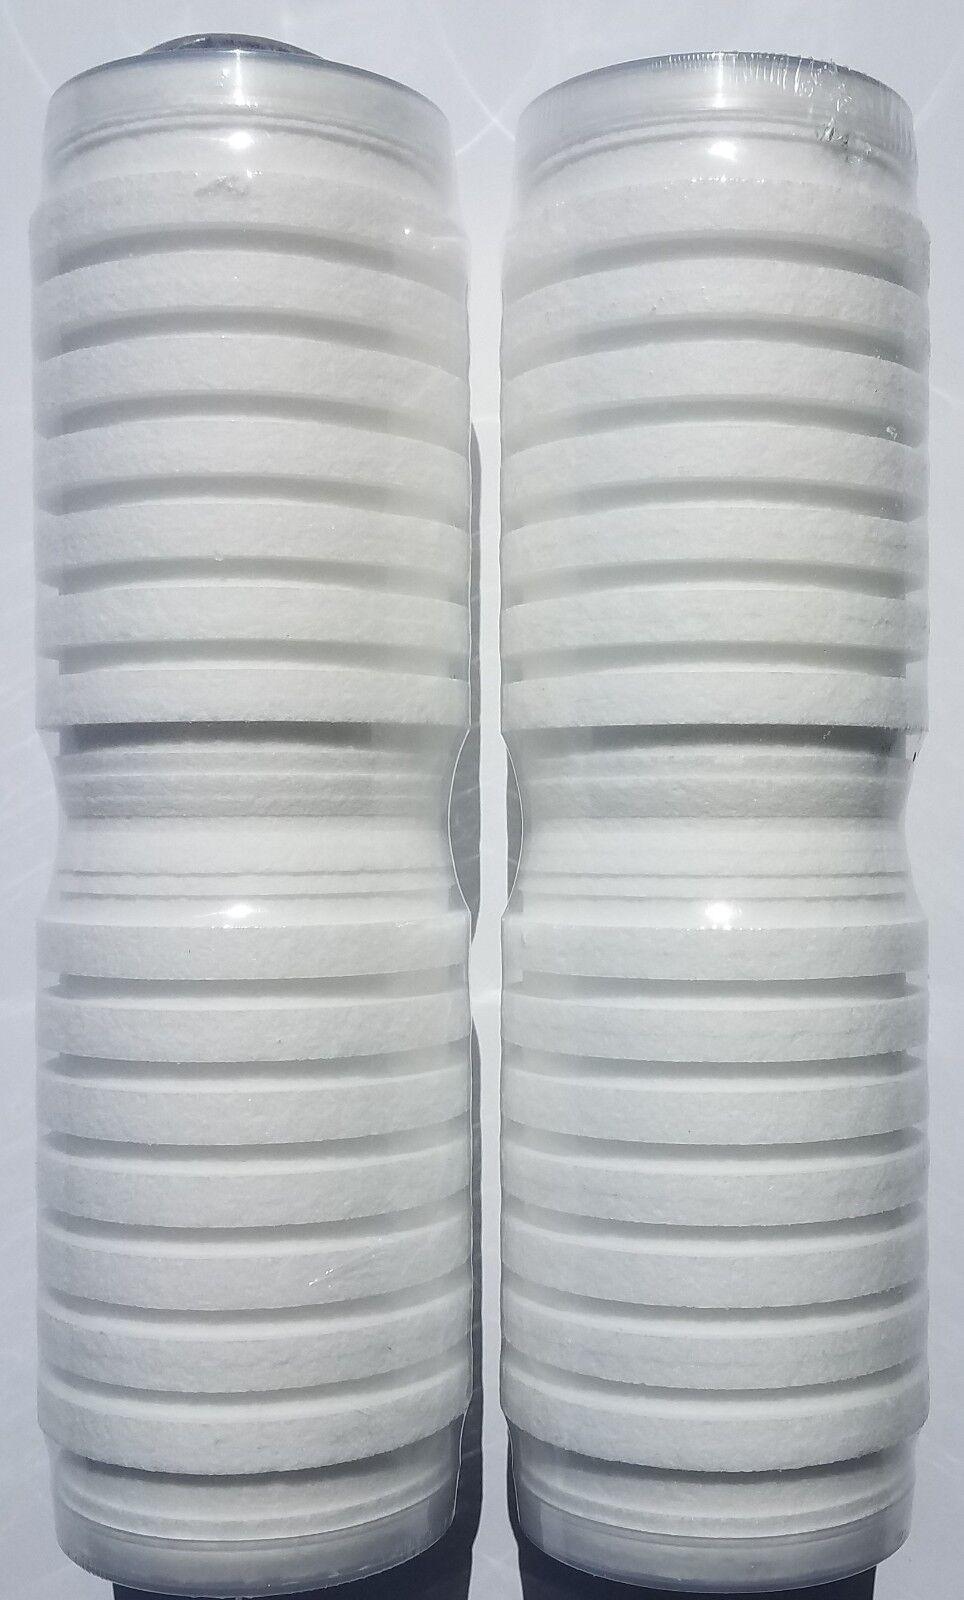 Aqua-Pure AP420 Water Filter Cartridge